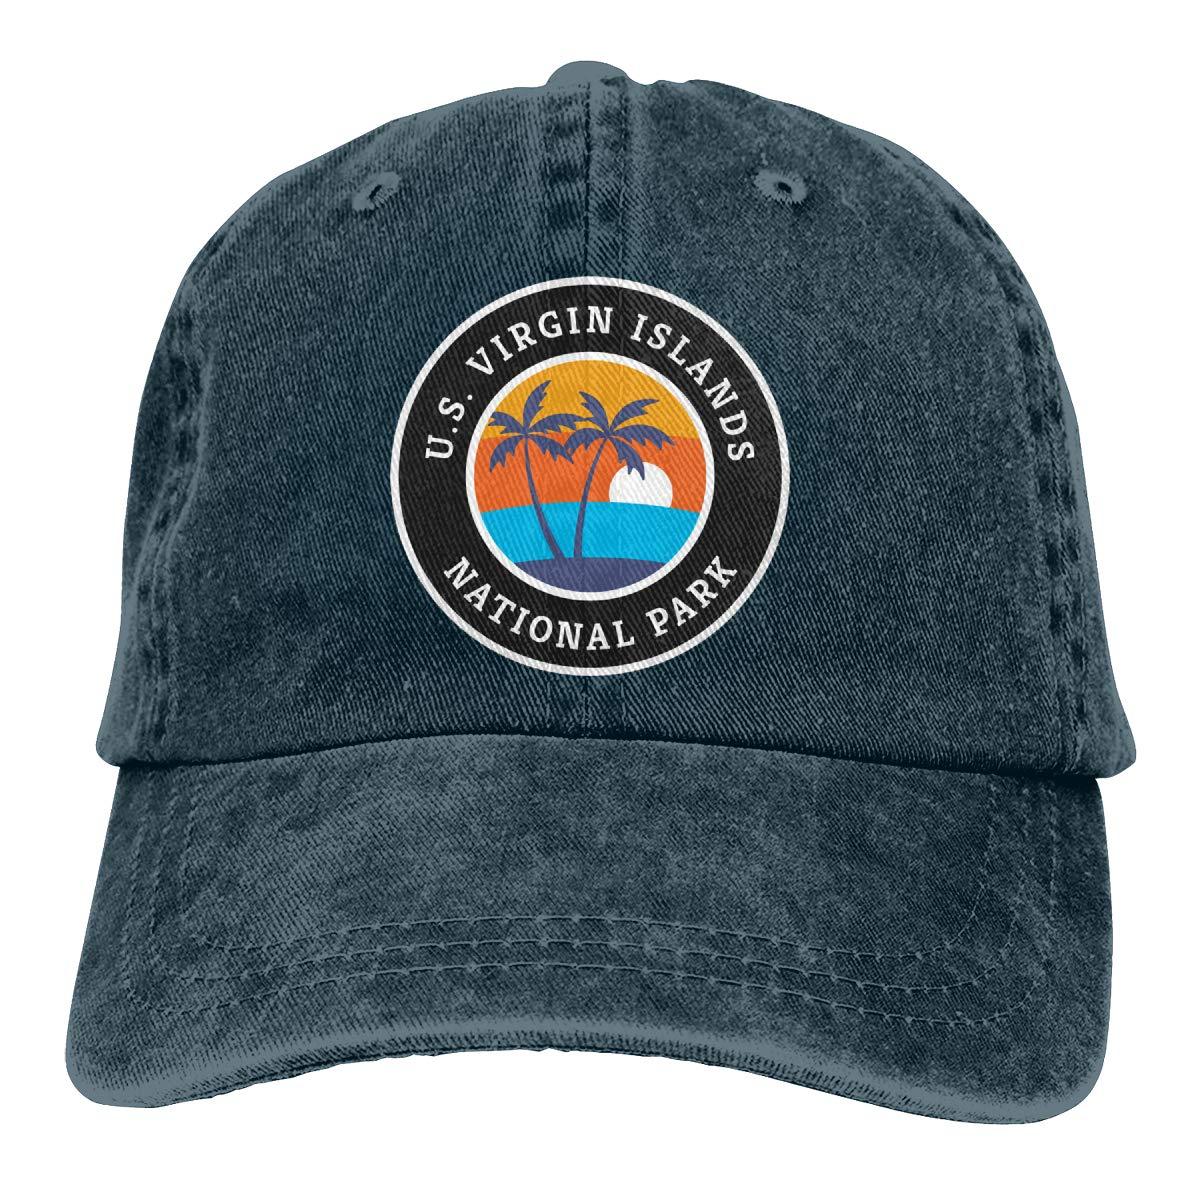 Men Women Vintage Denim Fabric Baseball Cap Virgin Island National Park Hiphop Cap